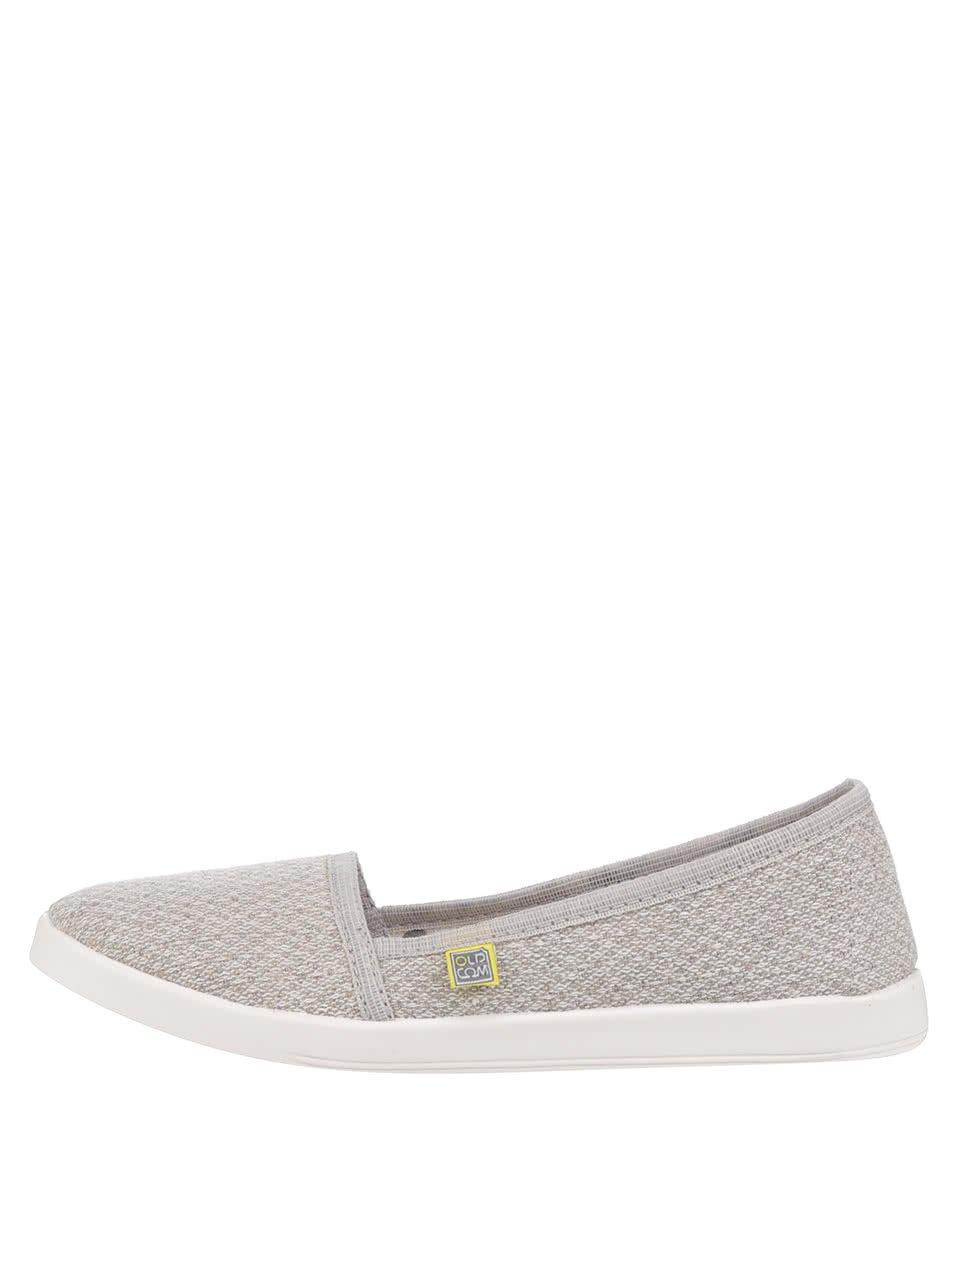 Béžové dámské loafers Oldcom Flax Linen